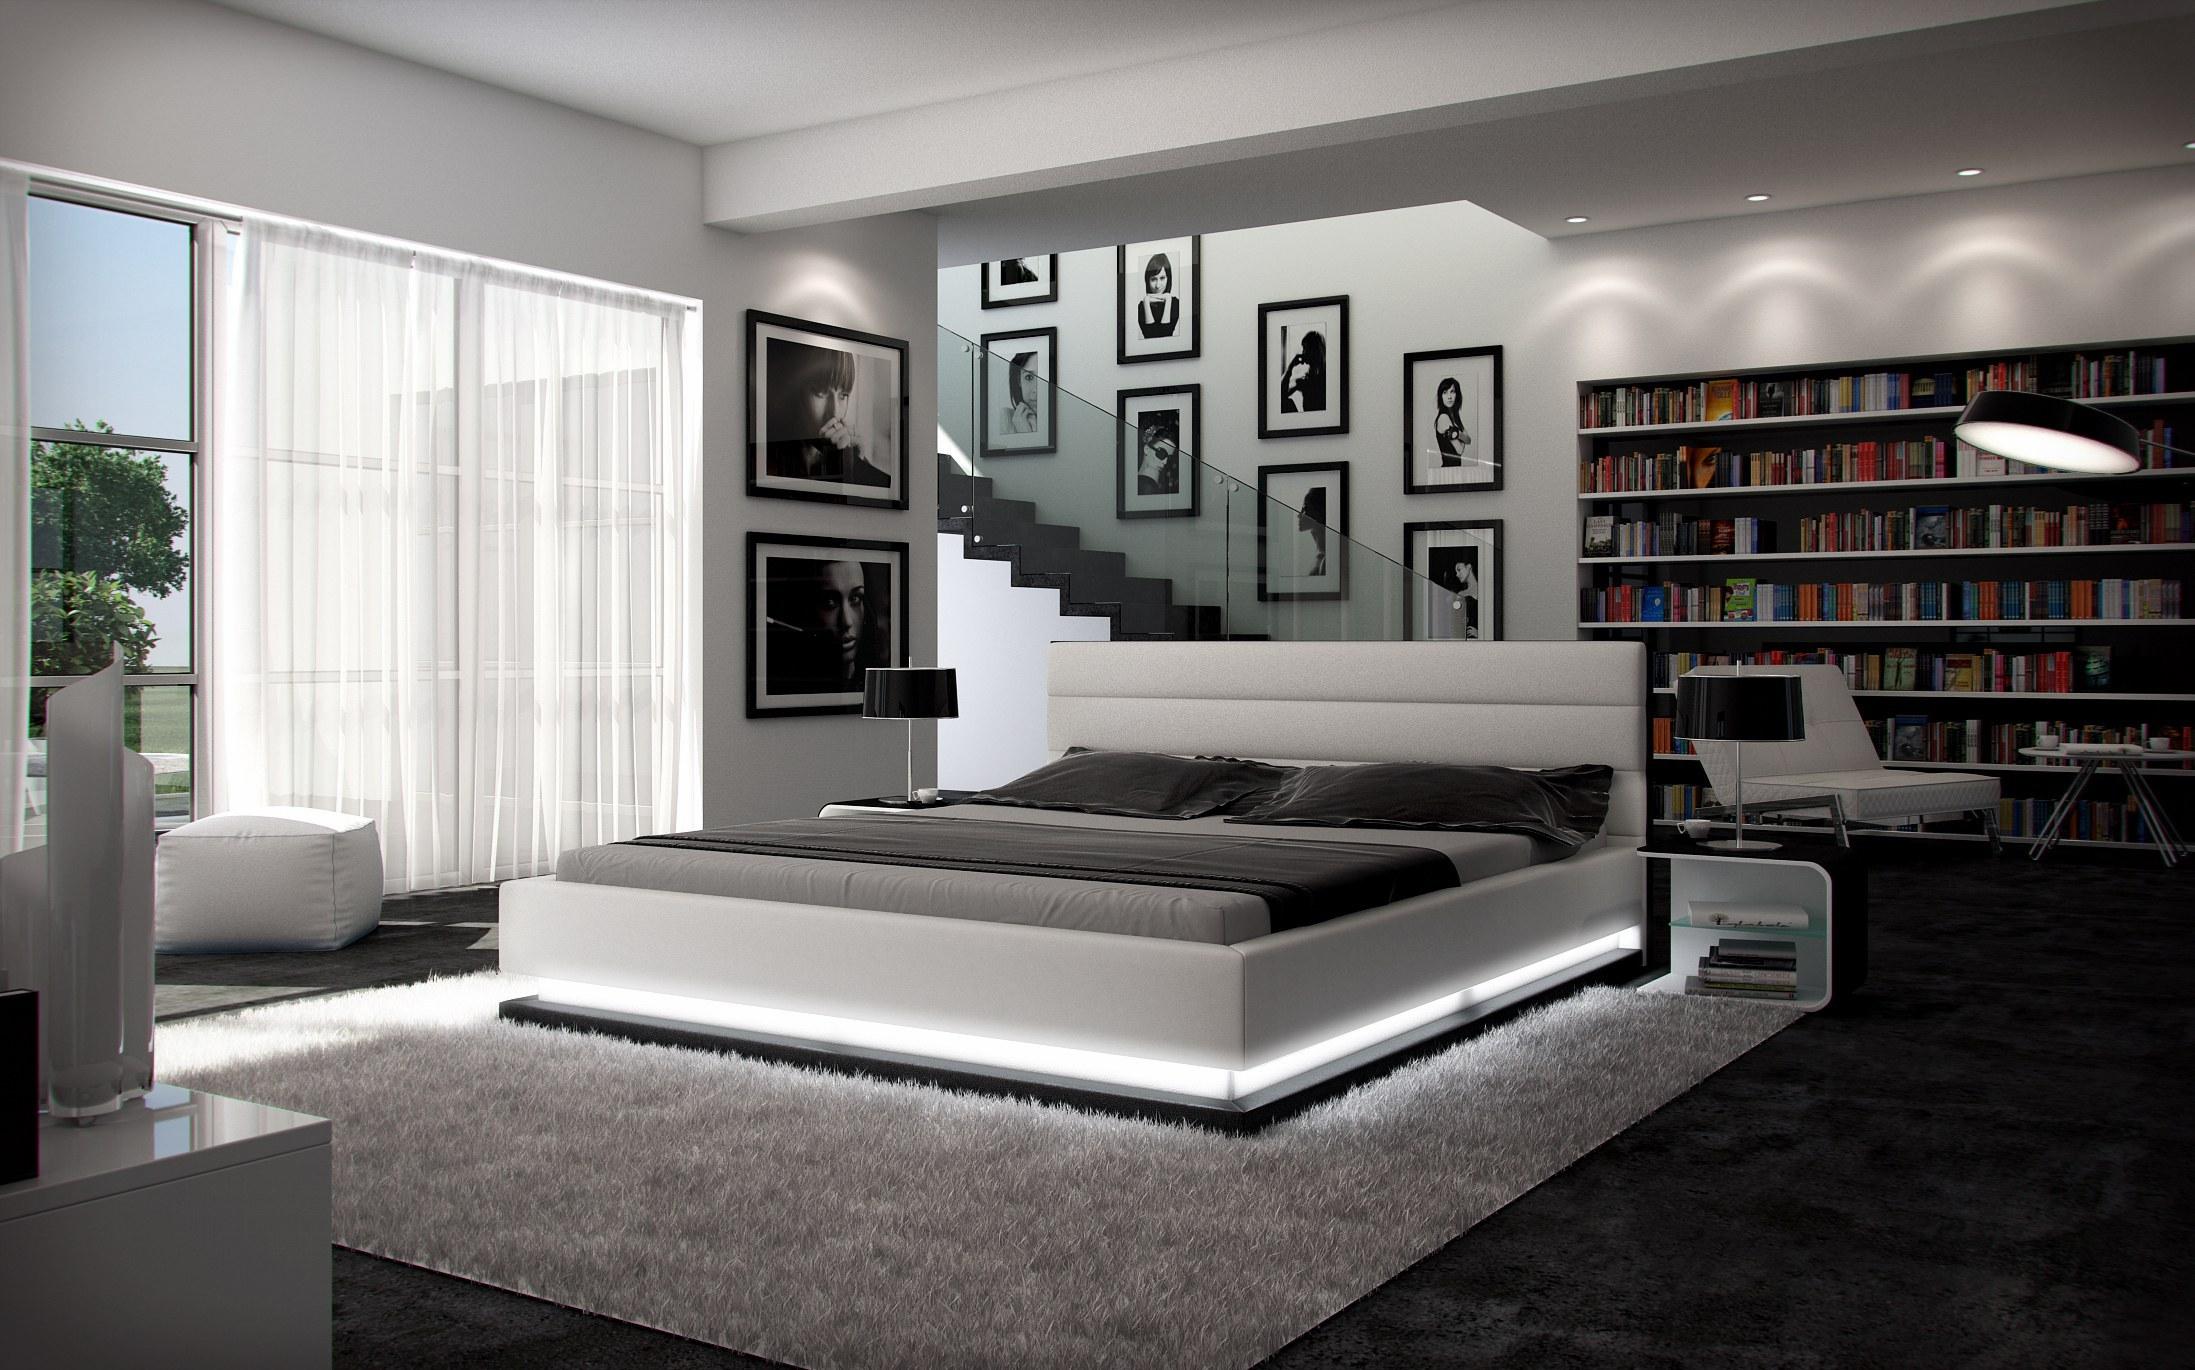 komplettbett moonlight mit matratze und lattenrost 180 x 200 cm 200 x 200 cm 200 x 220 cm